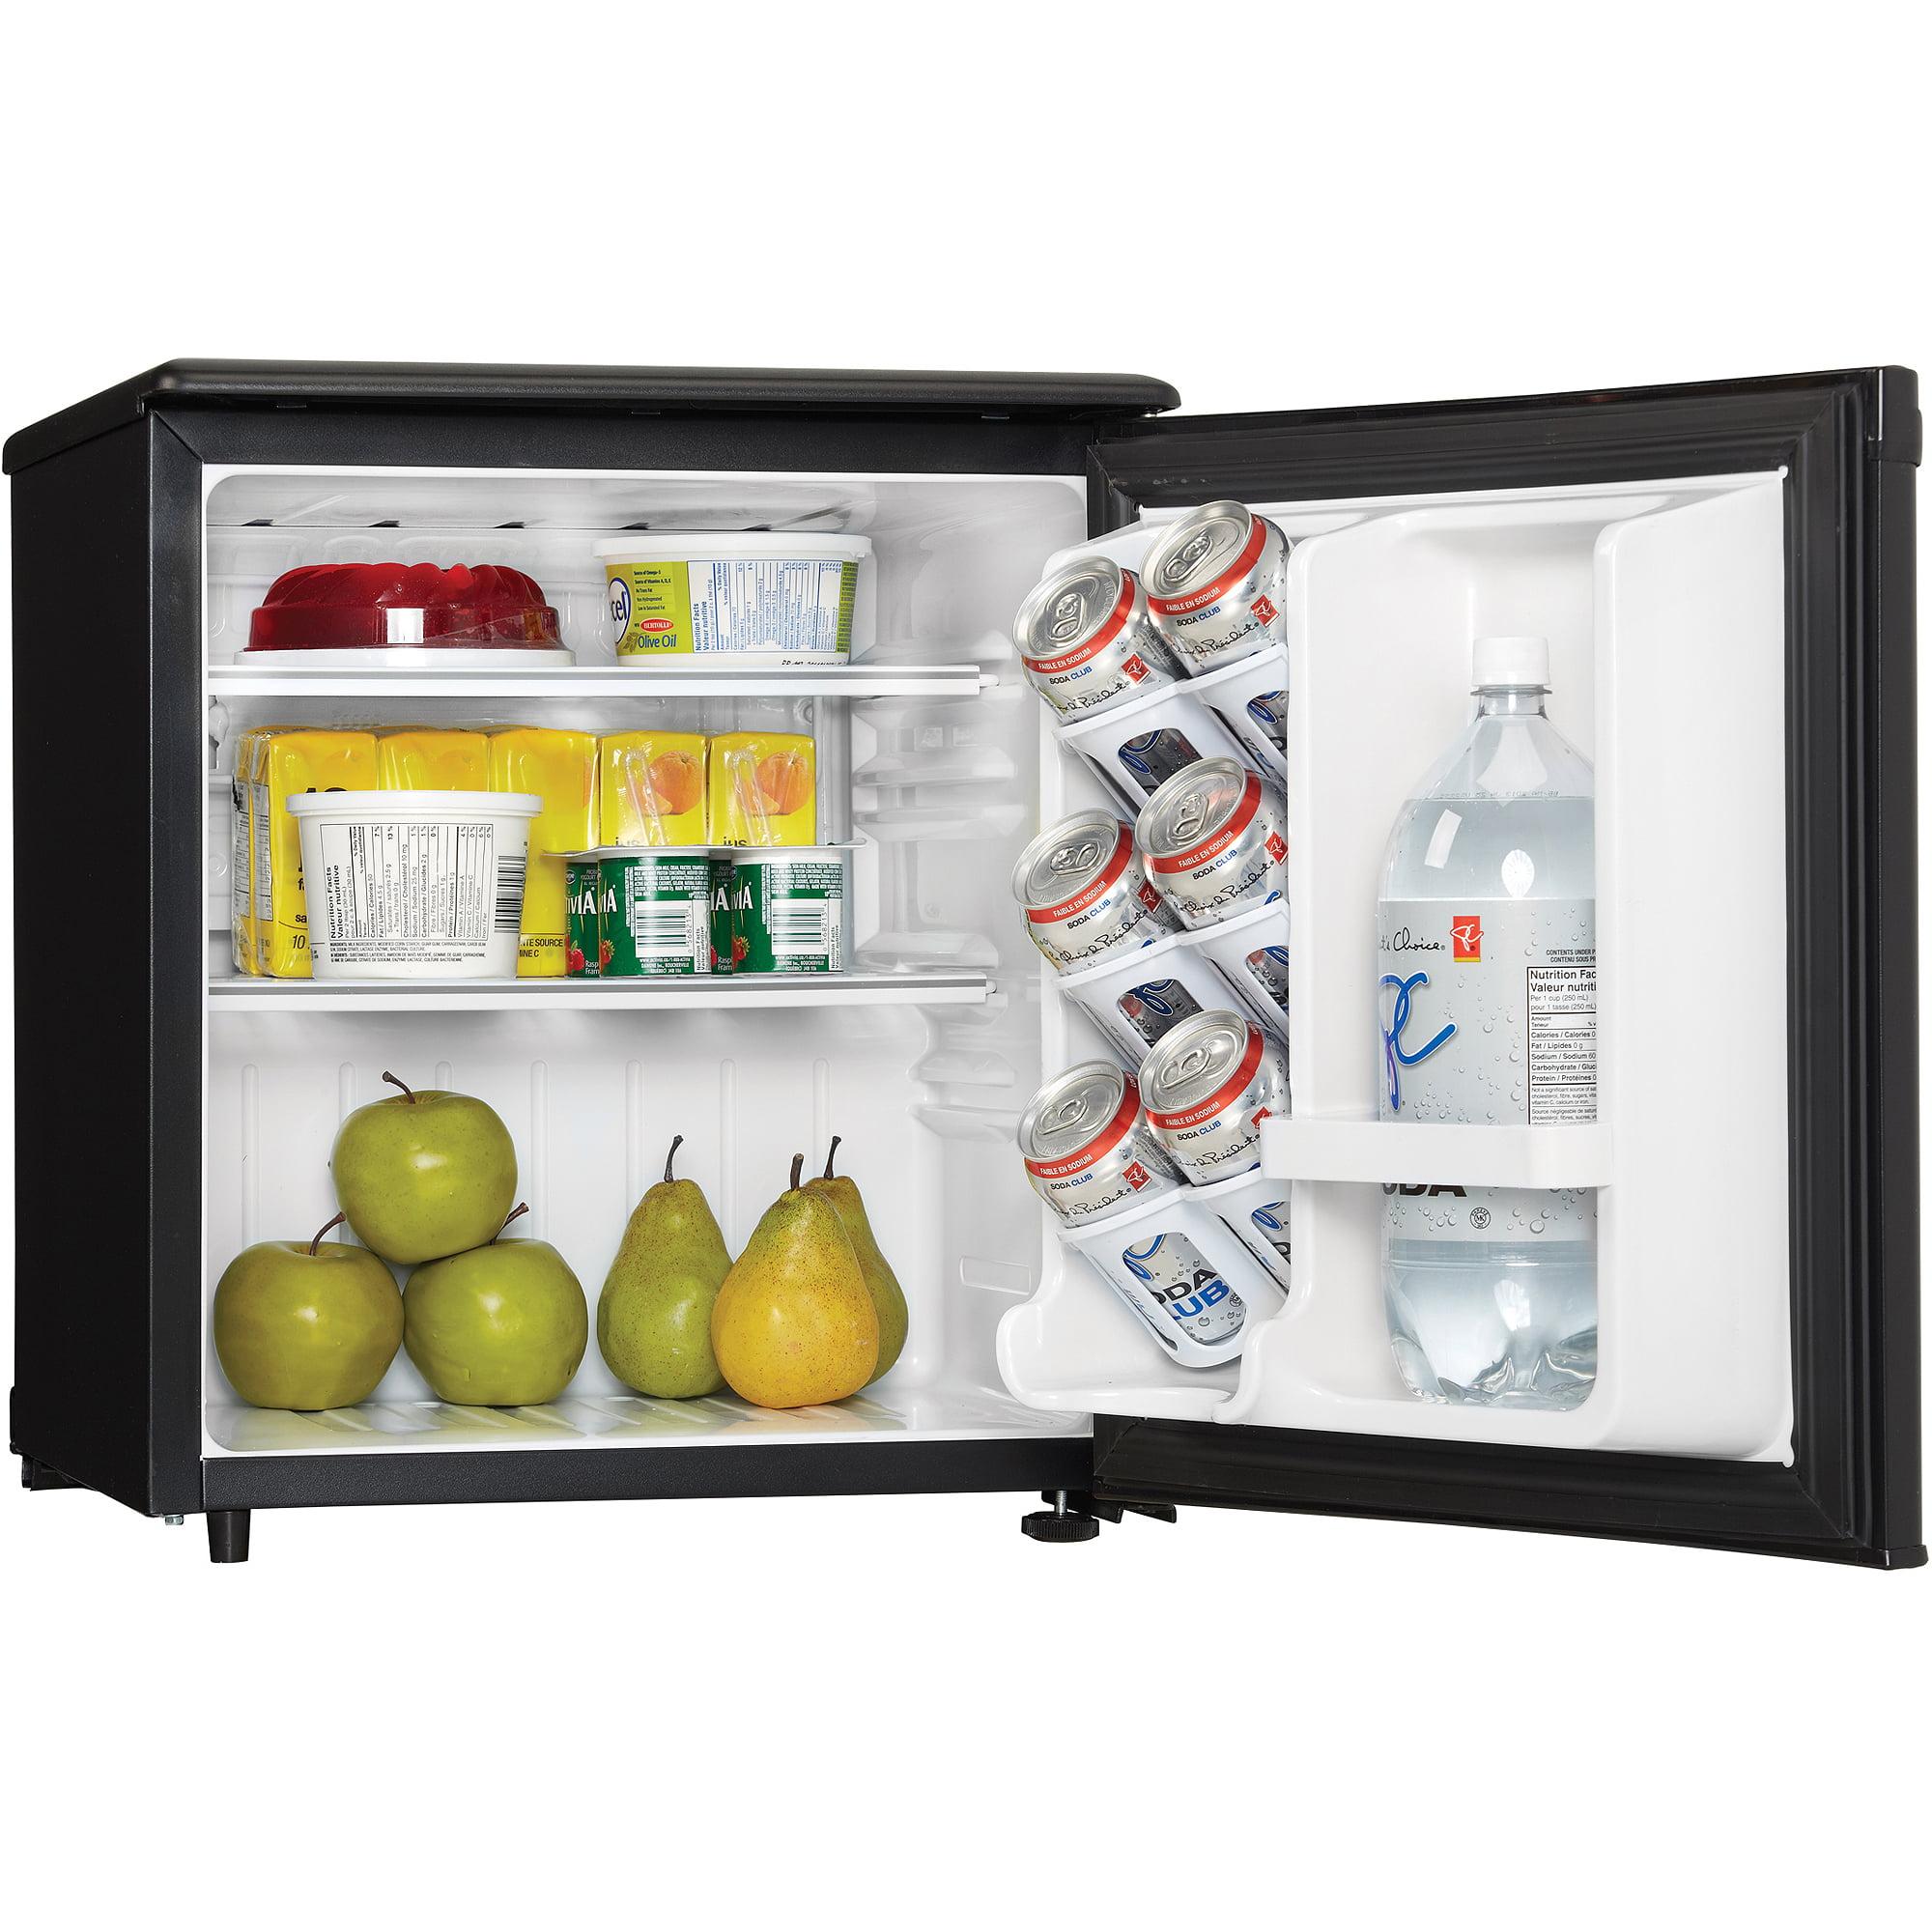 Cincinnati Refrigerator Repair Danby Designer 18 Cu Ft All Refrigerator Walmartcom